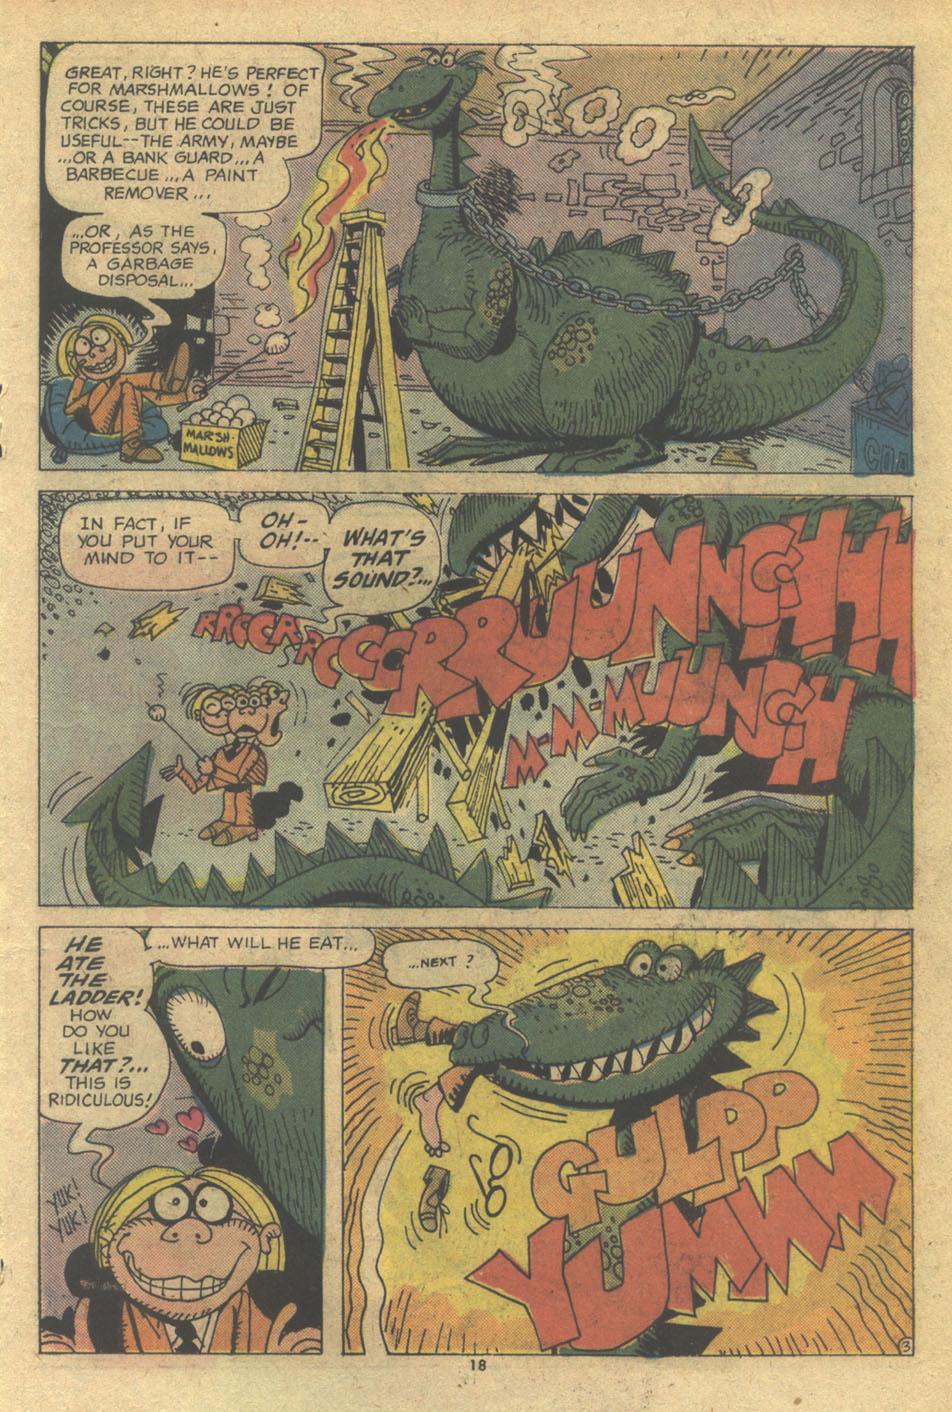 Read online Plop! comic -  Issue #10 - 19